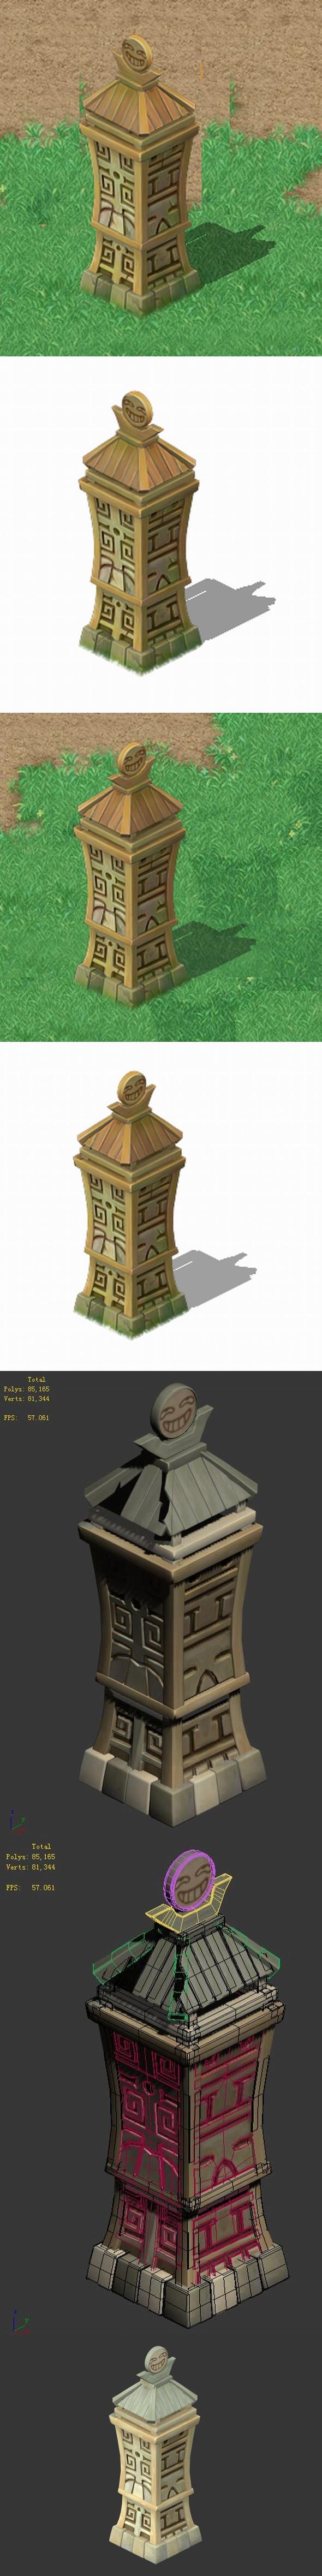 Cartoon world - Wan no border 04 - 3DOcean Item for Sale